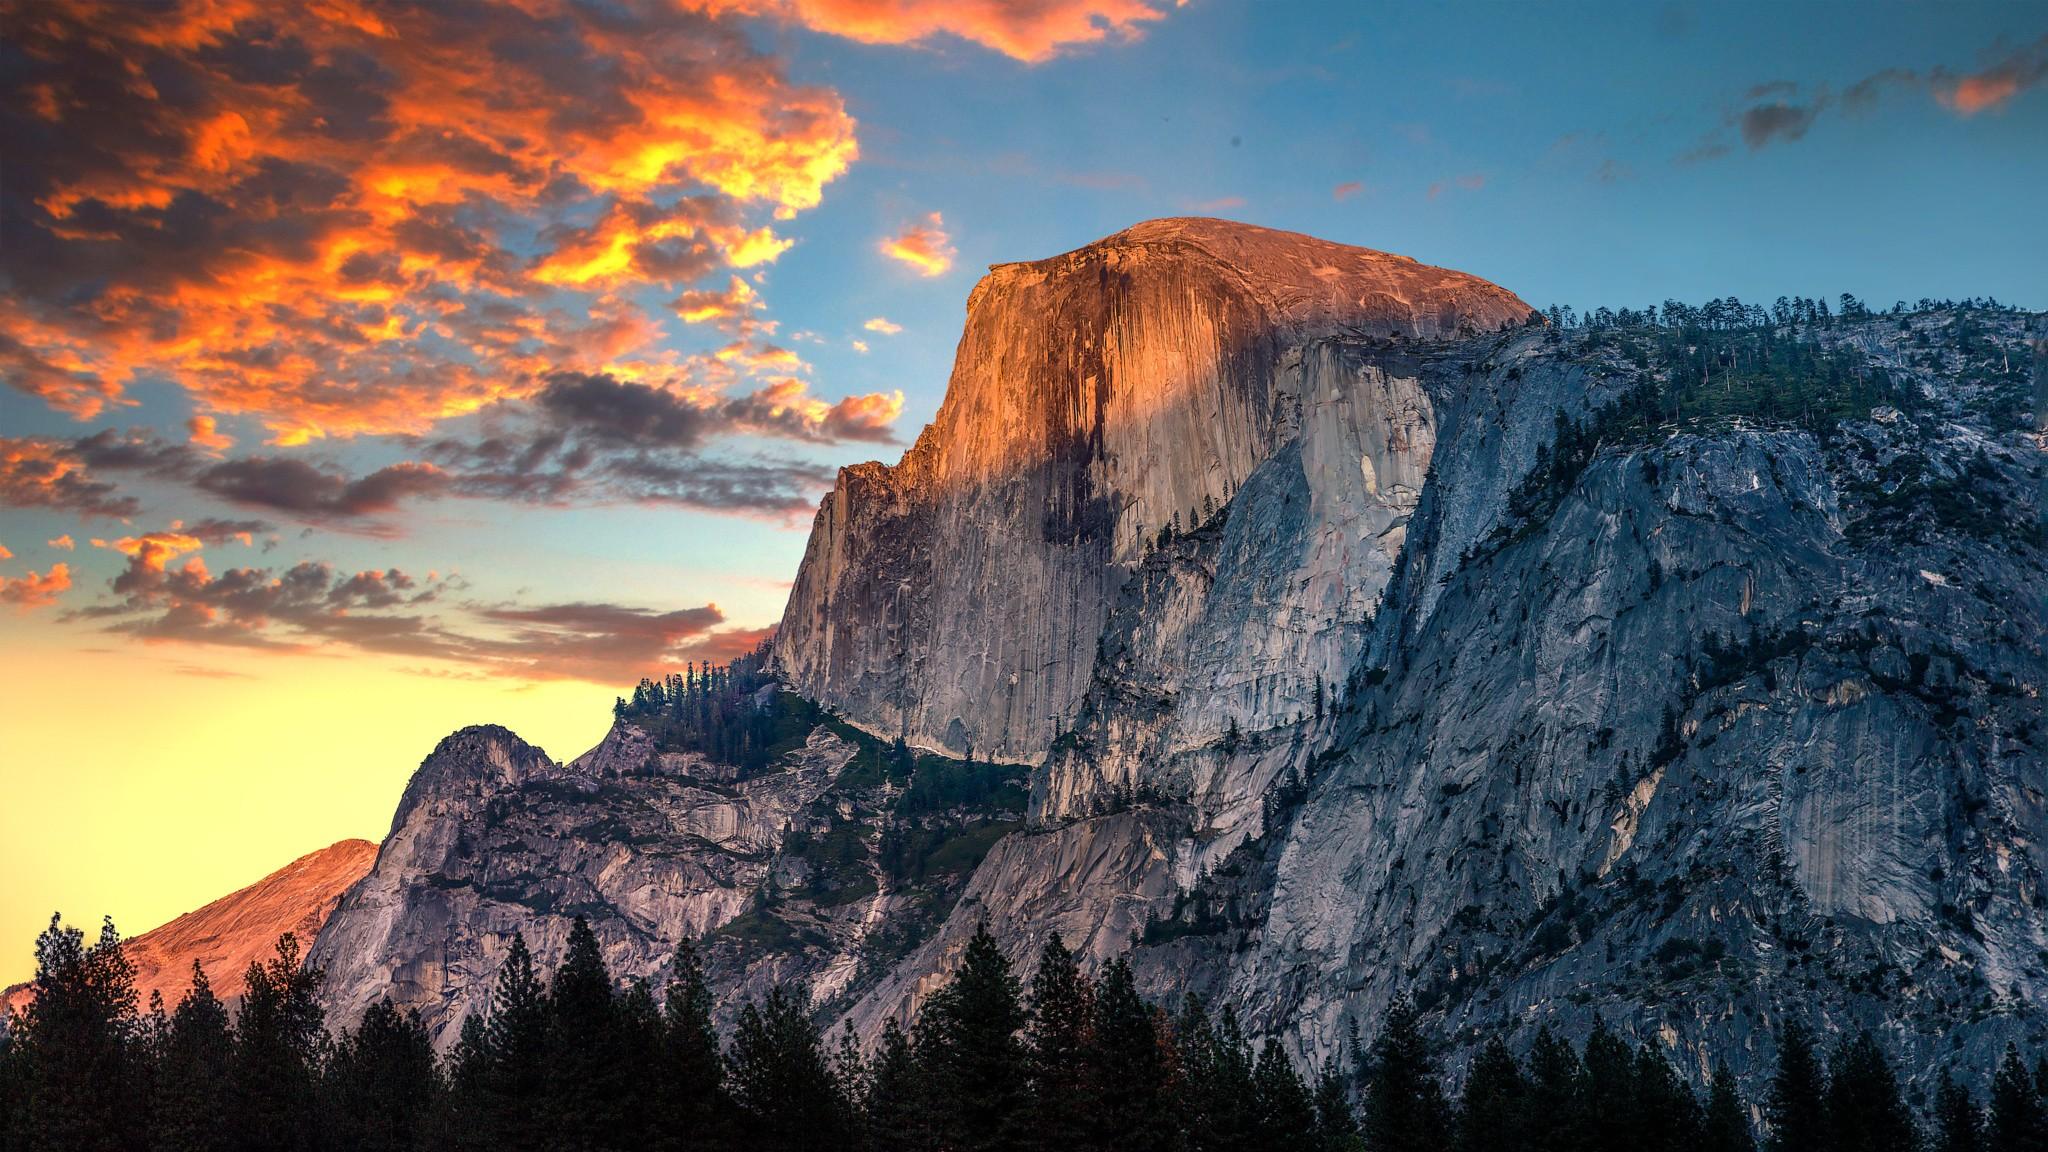 Wallpaper Mountains Sunset Rock Nature Sky Sunrise